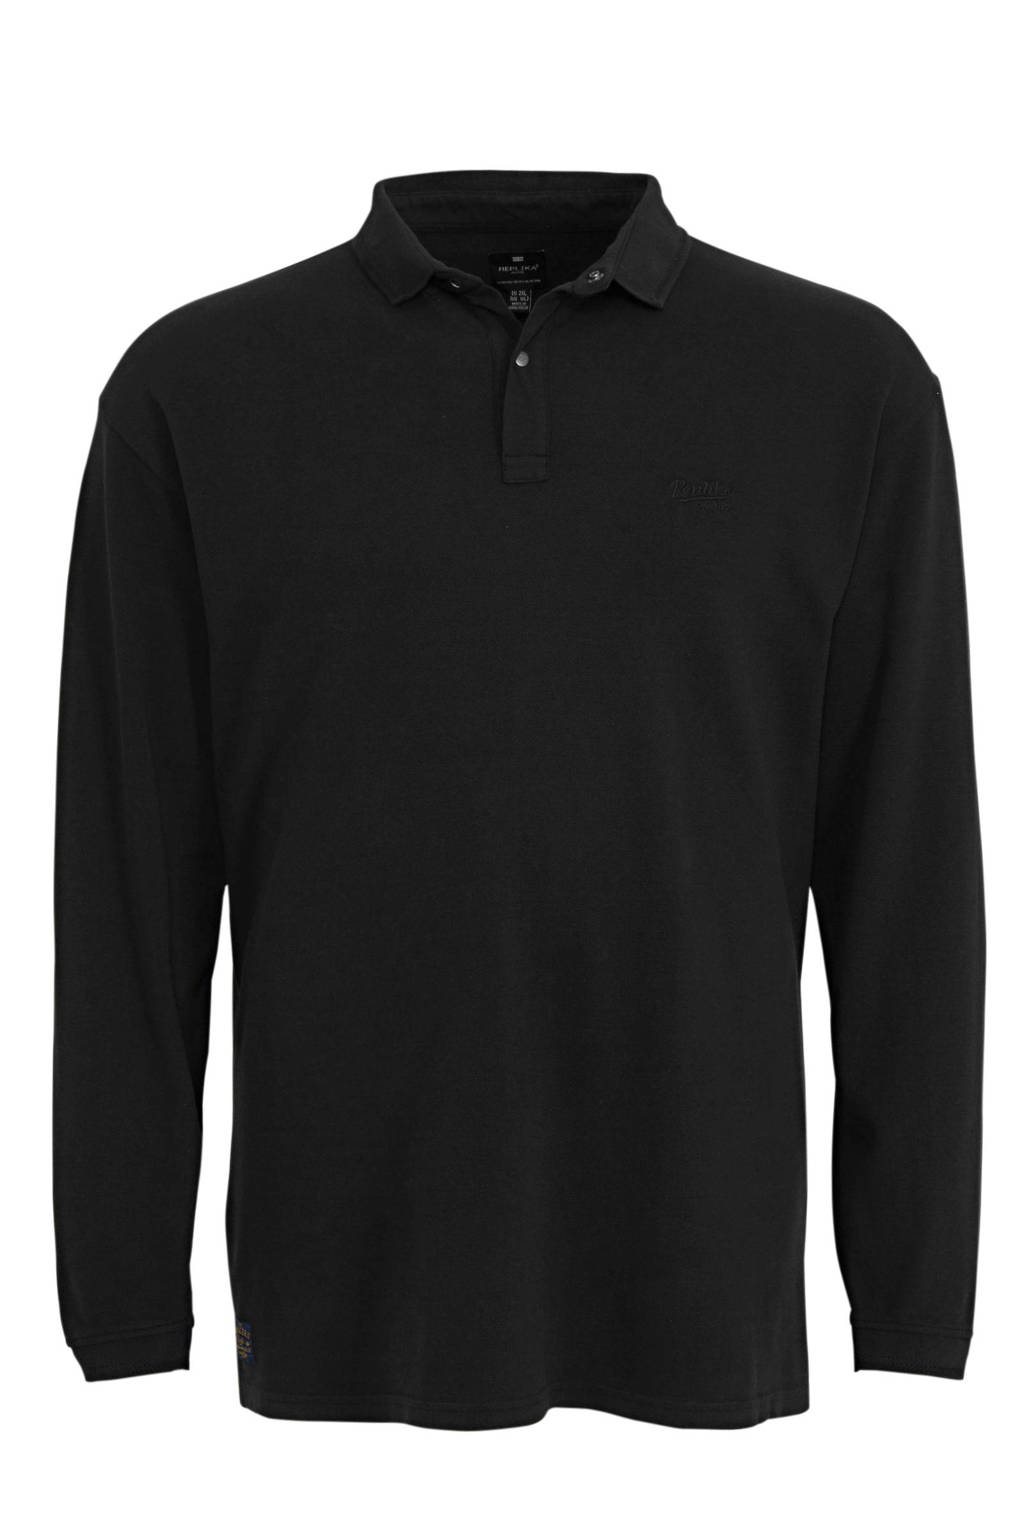 Replika +size regular fit polo zwart, Zwart